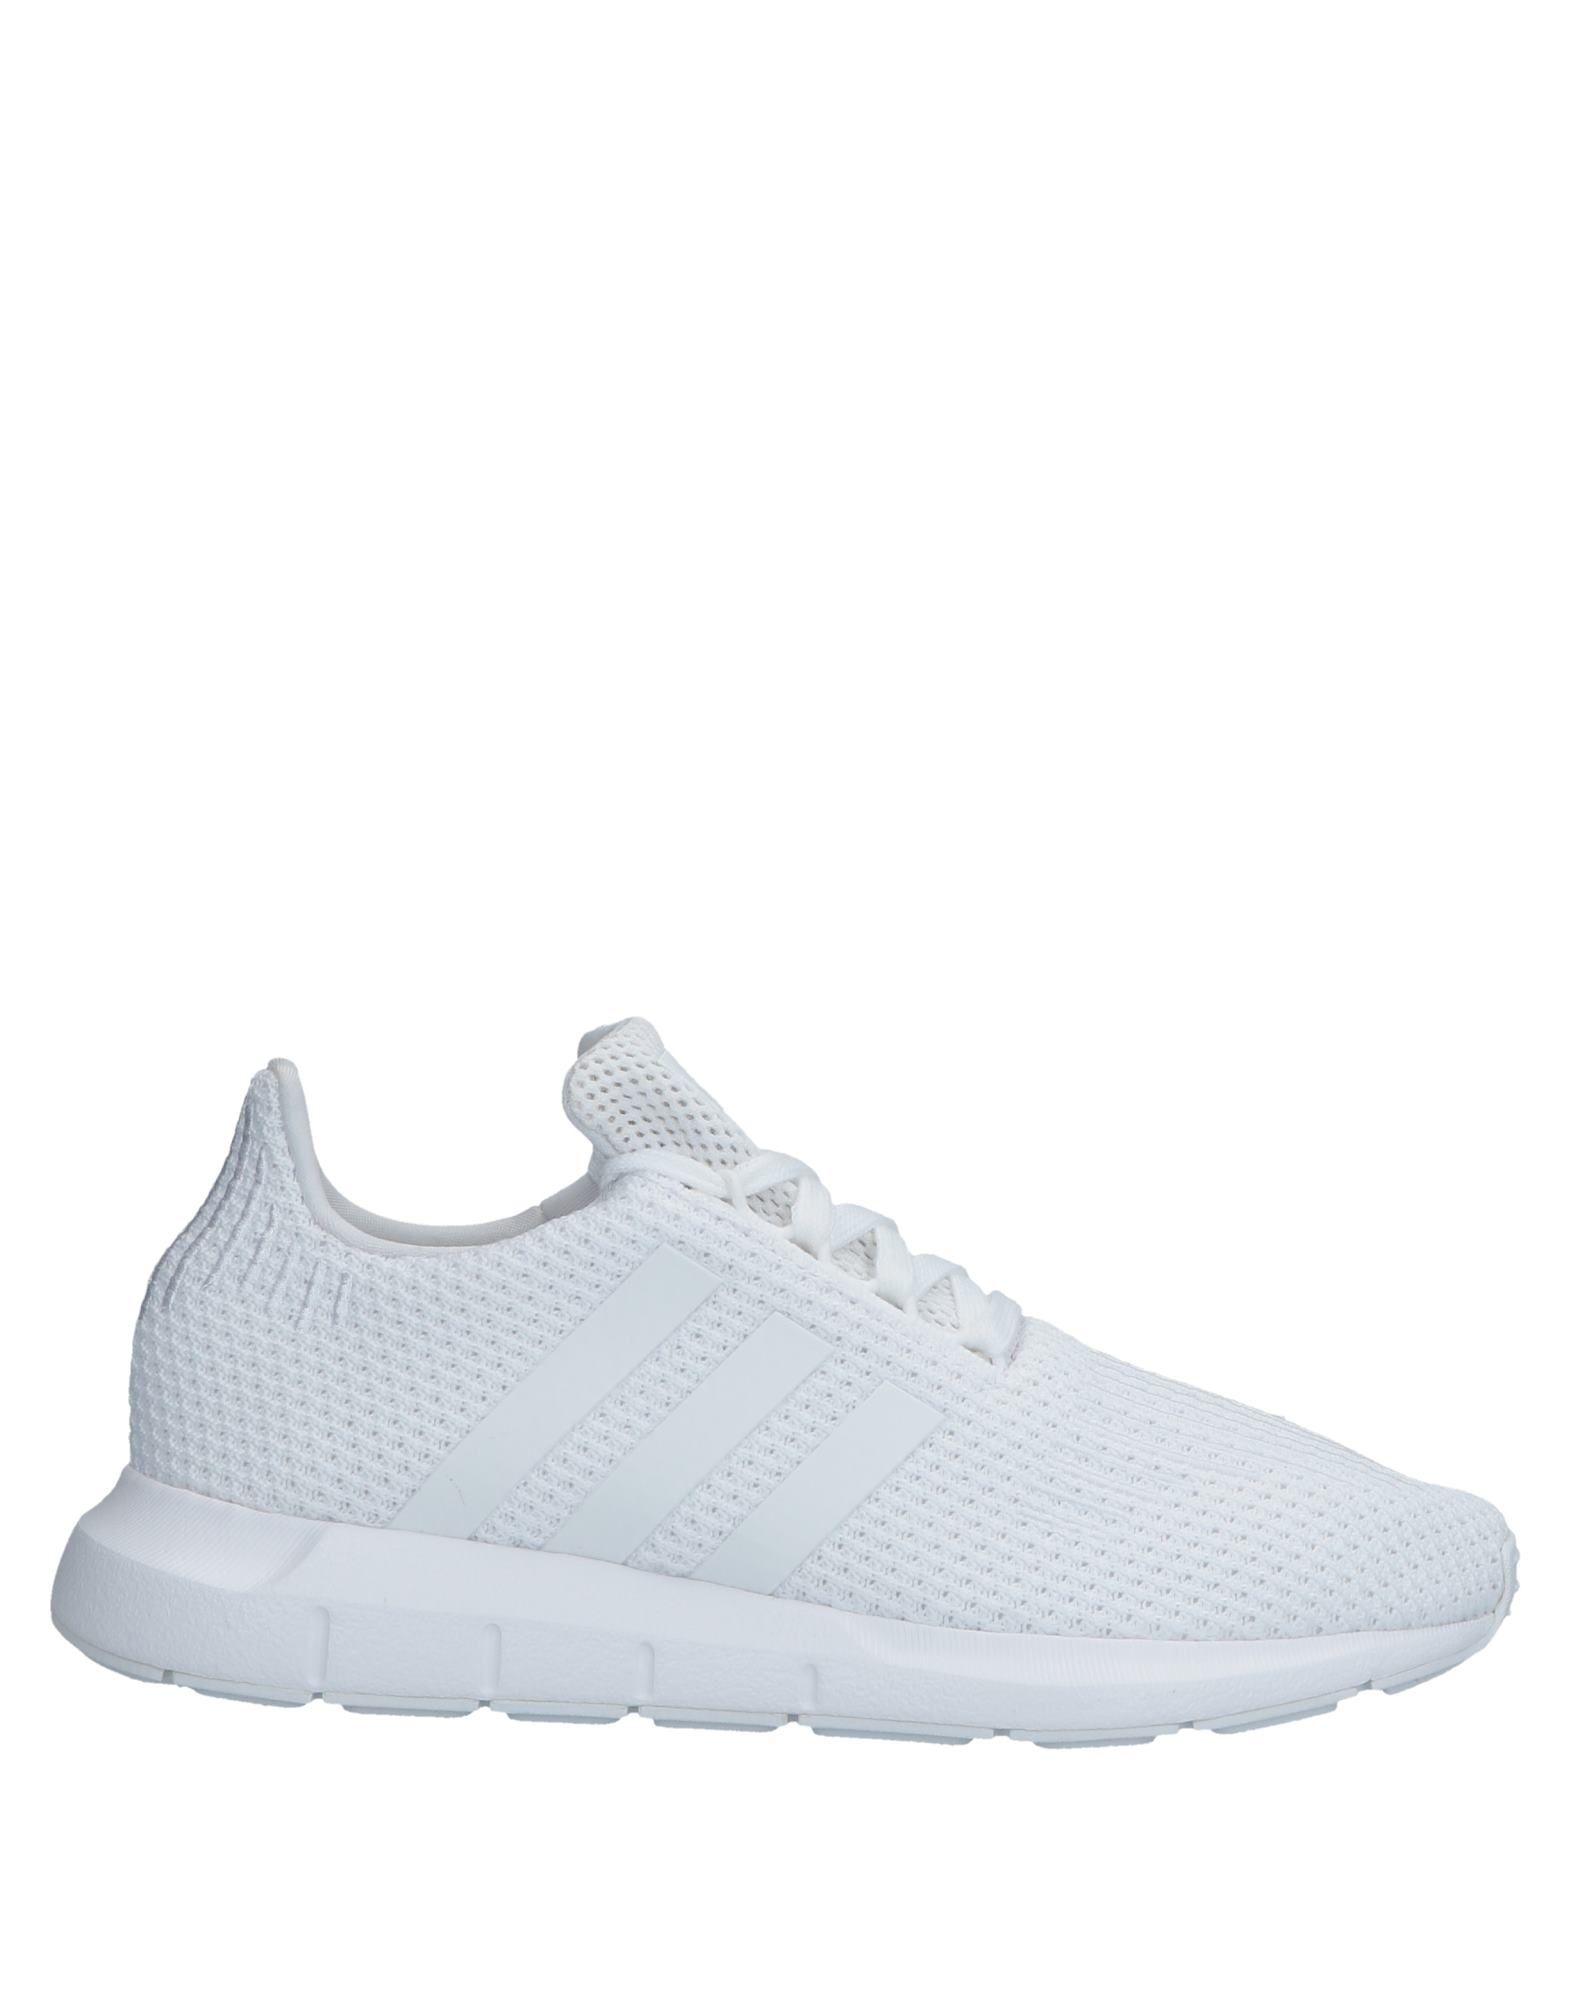 Adidas on Originals Sneakers - Women Adidas Originals Sneakers online on Adidas  Australia - 11561774RR 355533